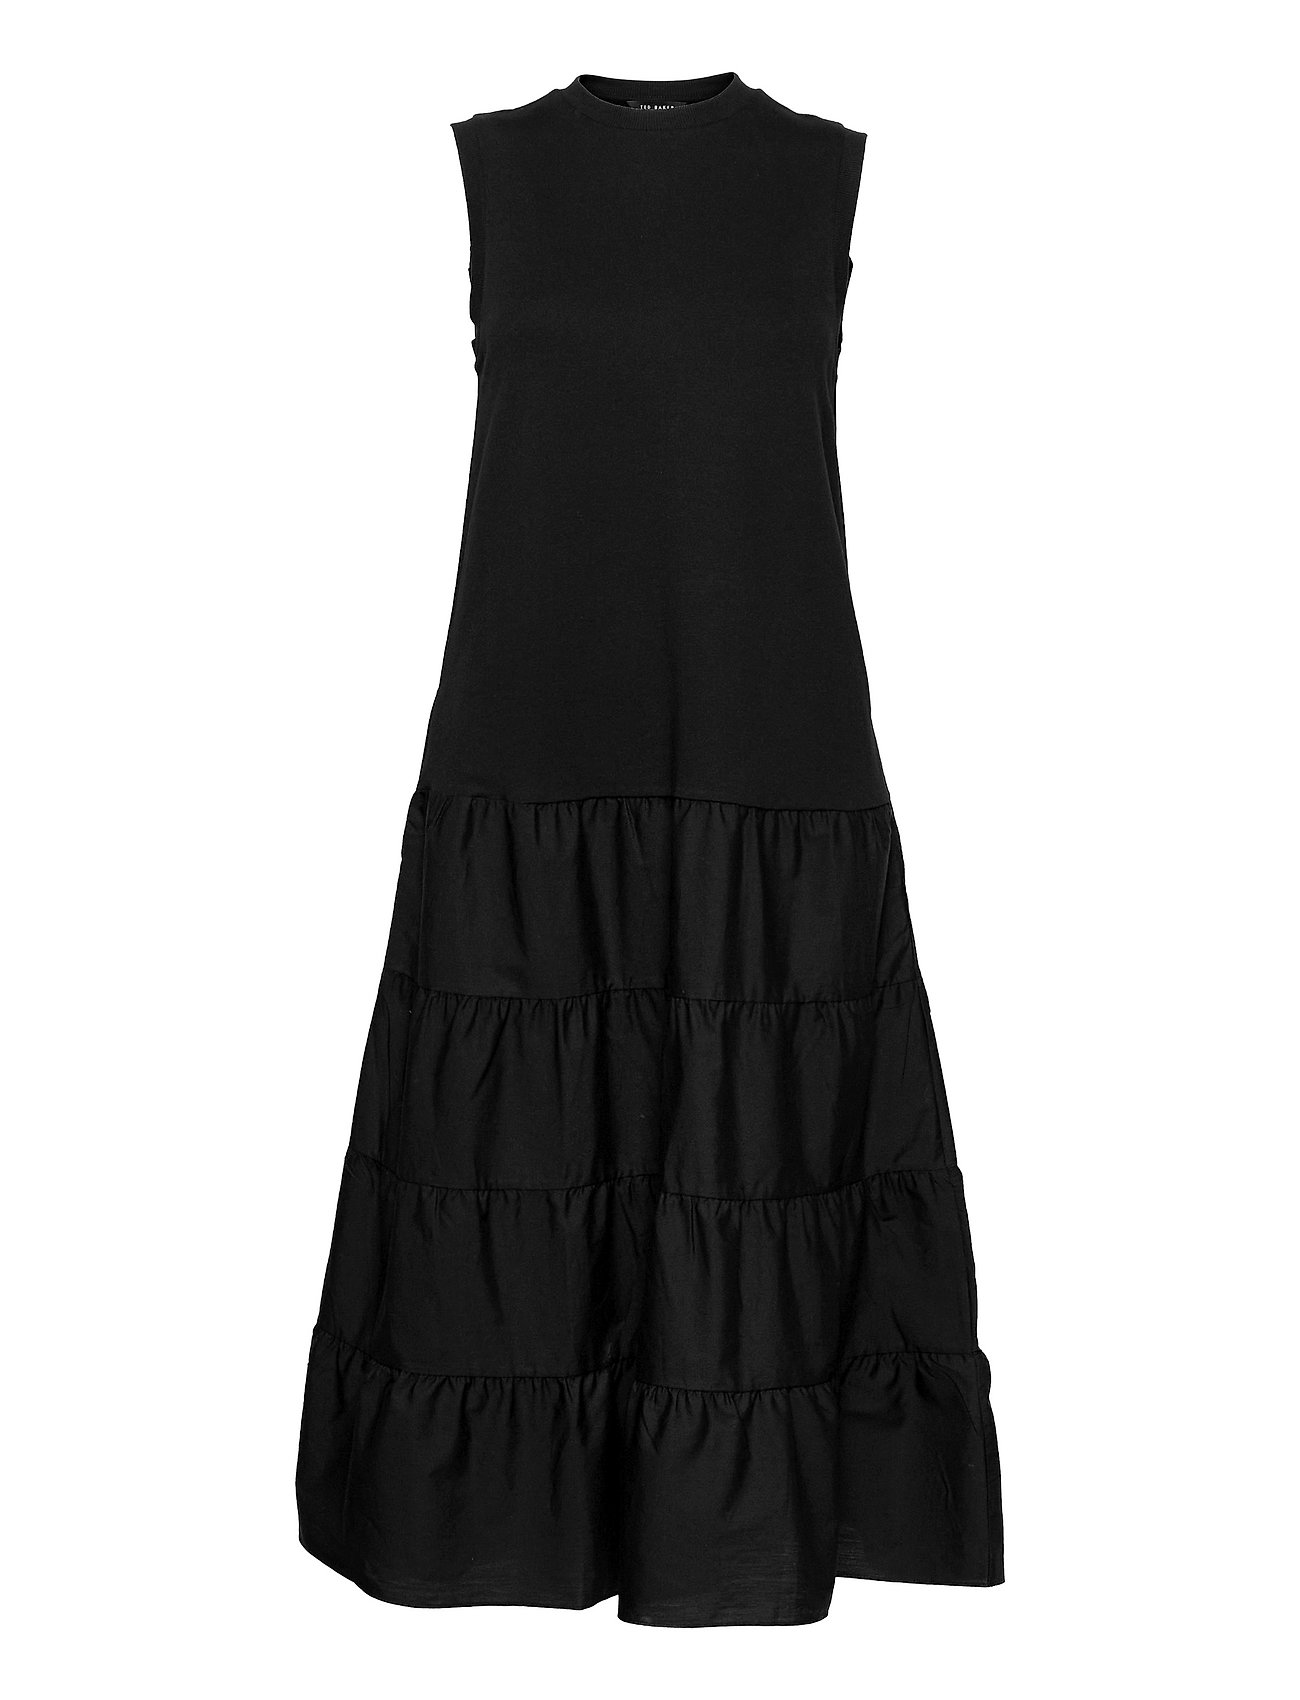 Viannee Dresses Cocktail Dresses Sort Ted Baker